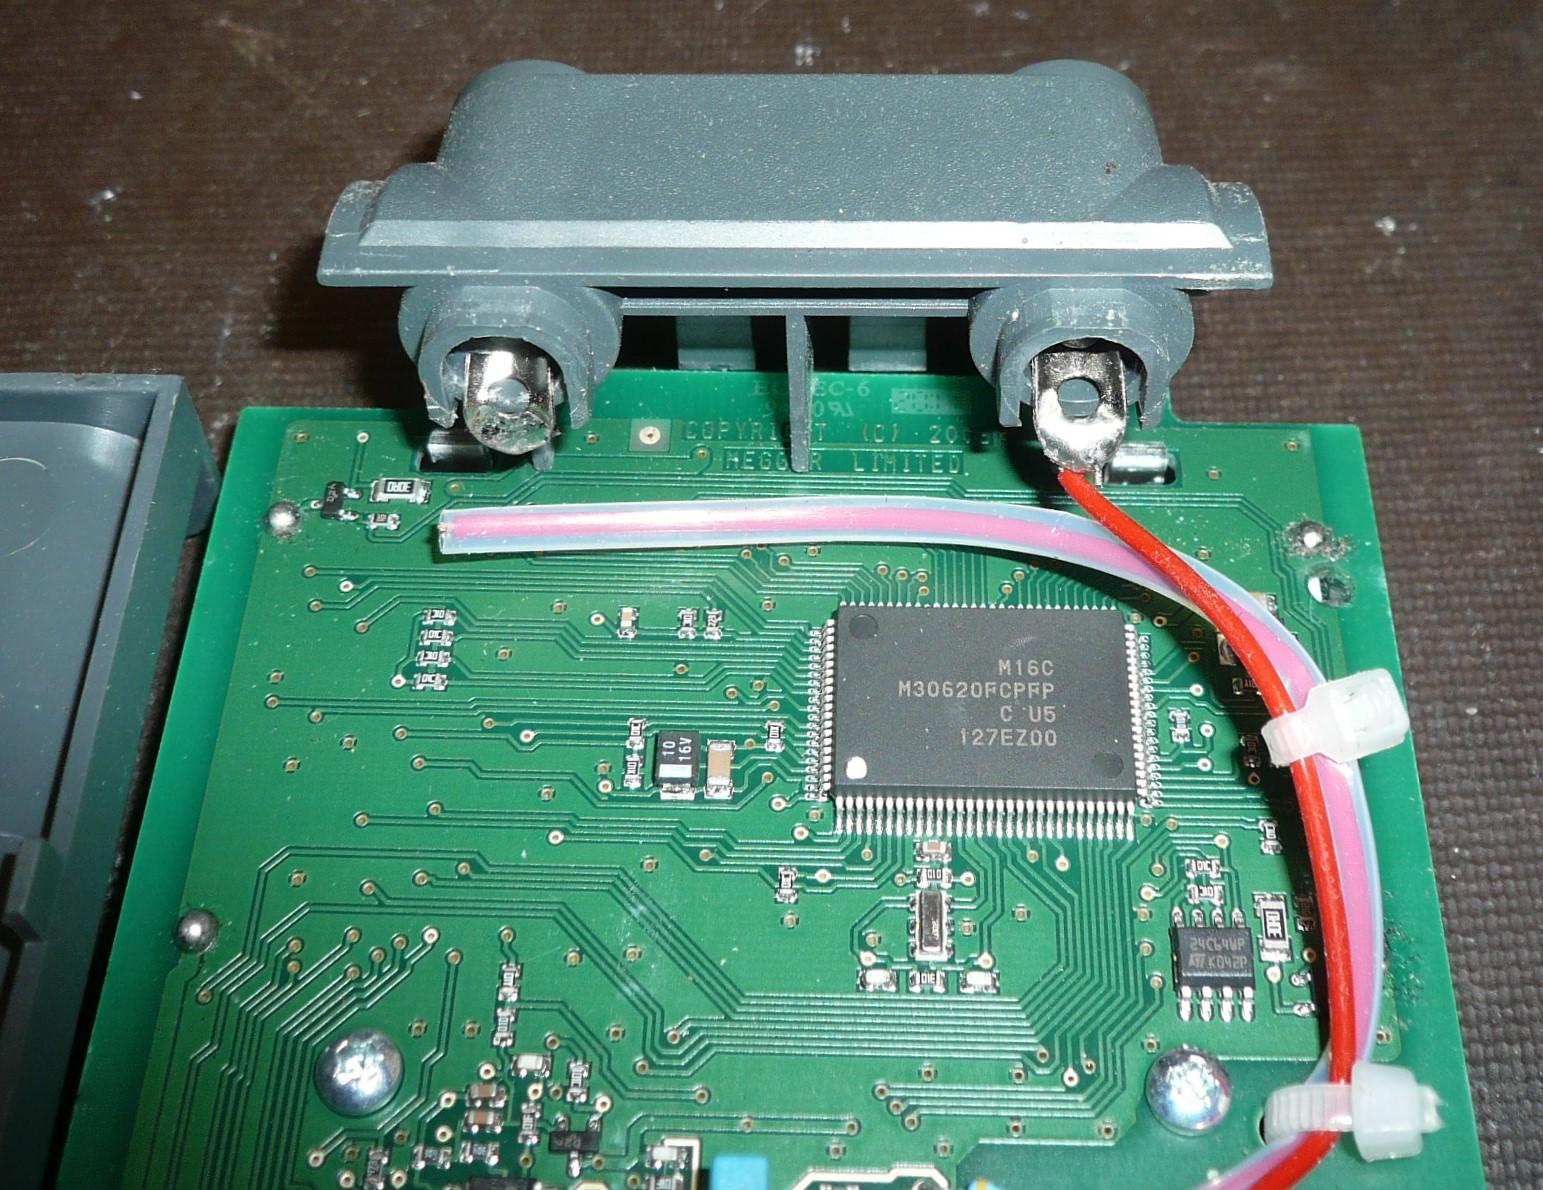 Blog Ecotech Services Ltd Addressing The Environmental Impact Of Ensil Electronic Circuit Board Repair Electronics Bad Design On A Megger Mit220